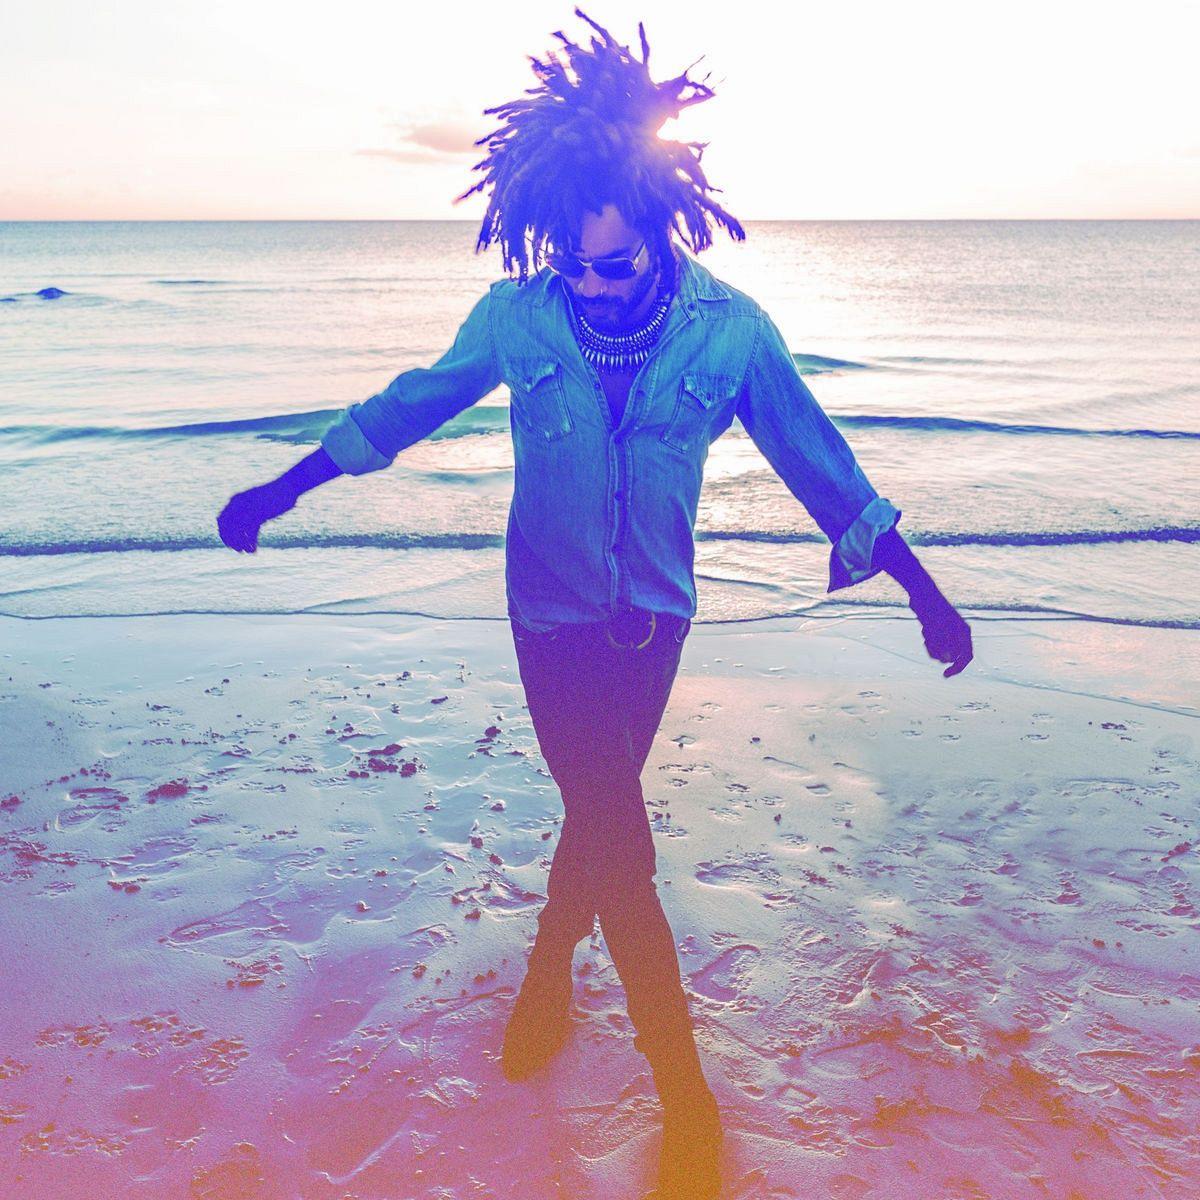 Lenny Kravitz - Raise Vibration album cover